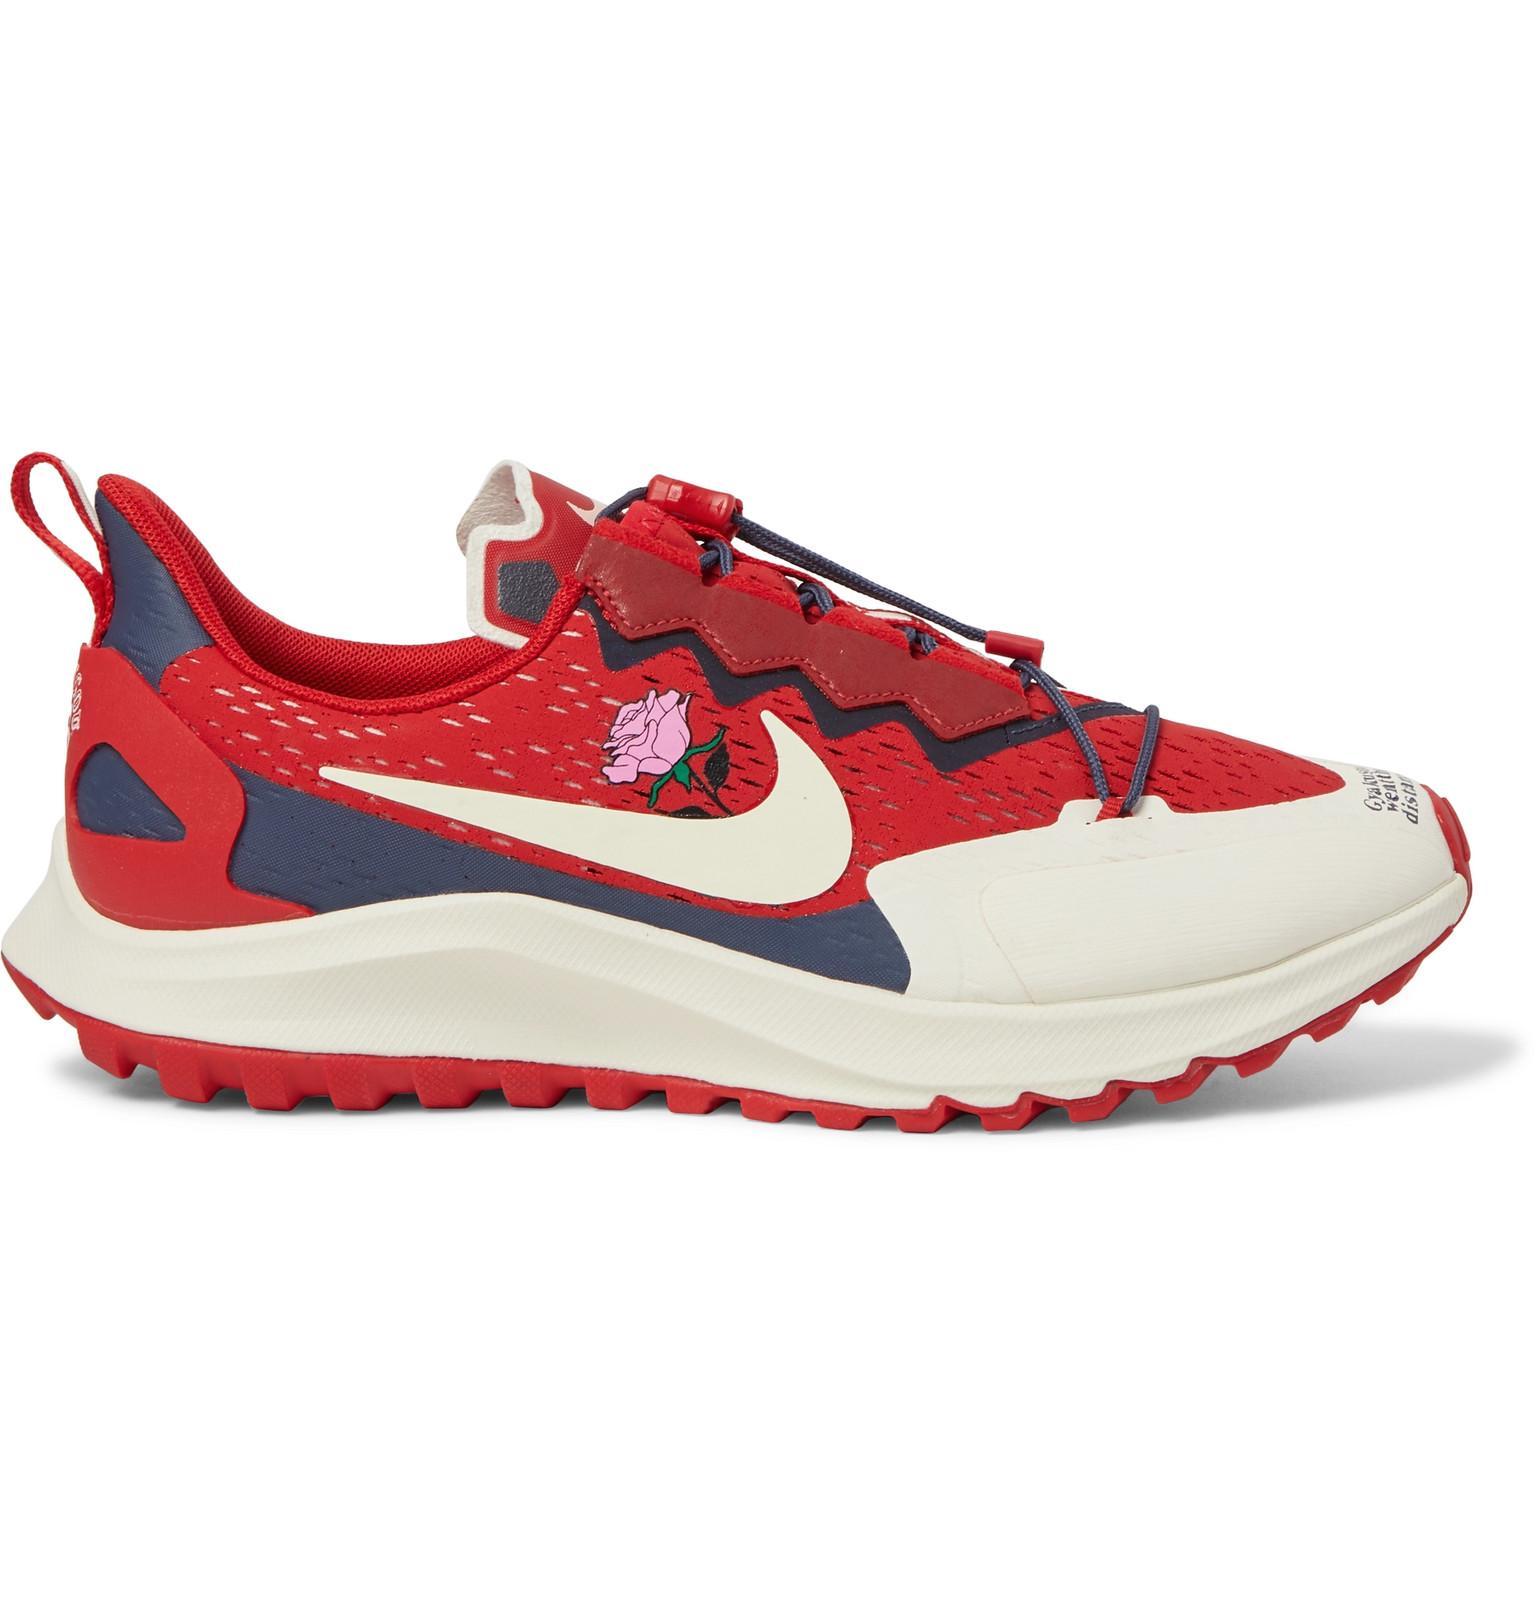 Inducir Una herramienta central que juega un papel importante. Repetirse  Nike Air Zoom Pegasus 36 Trail test . . . review A solid trail .